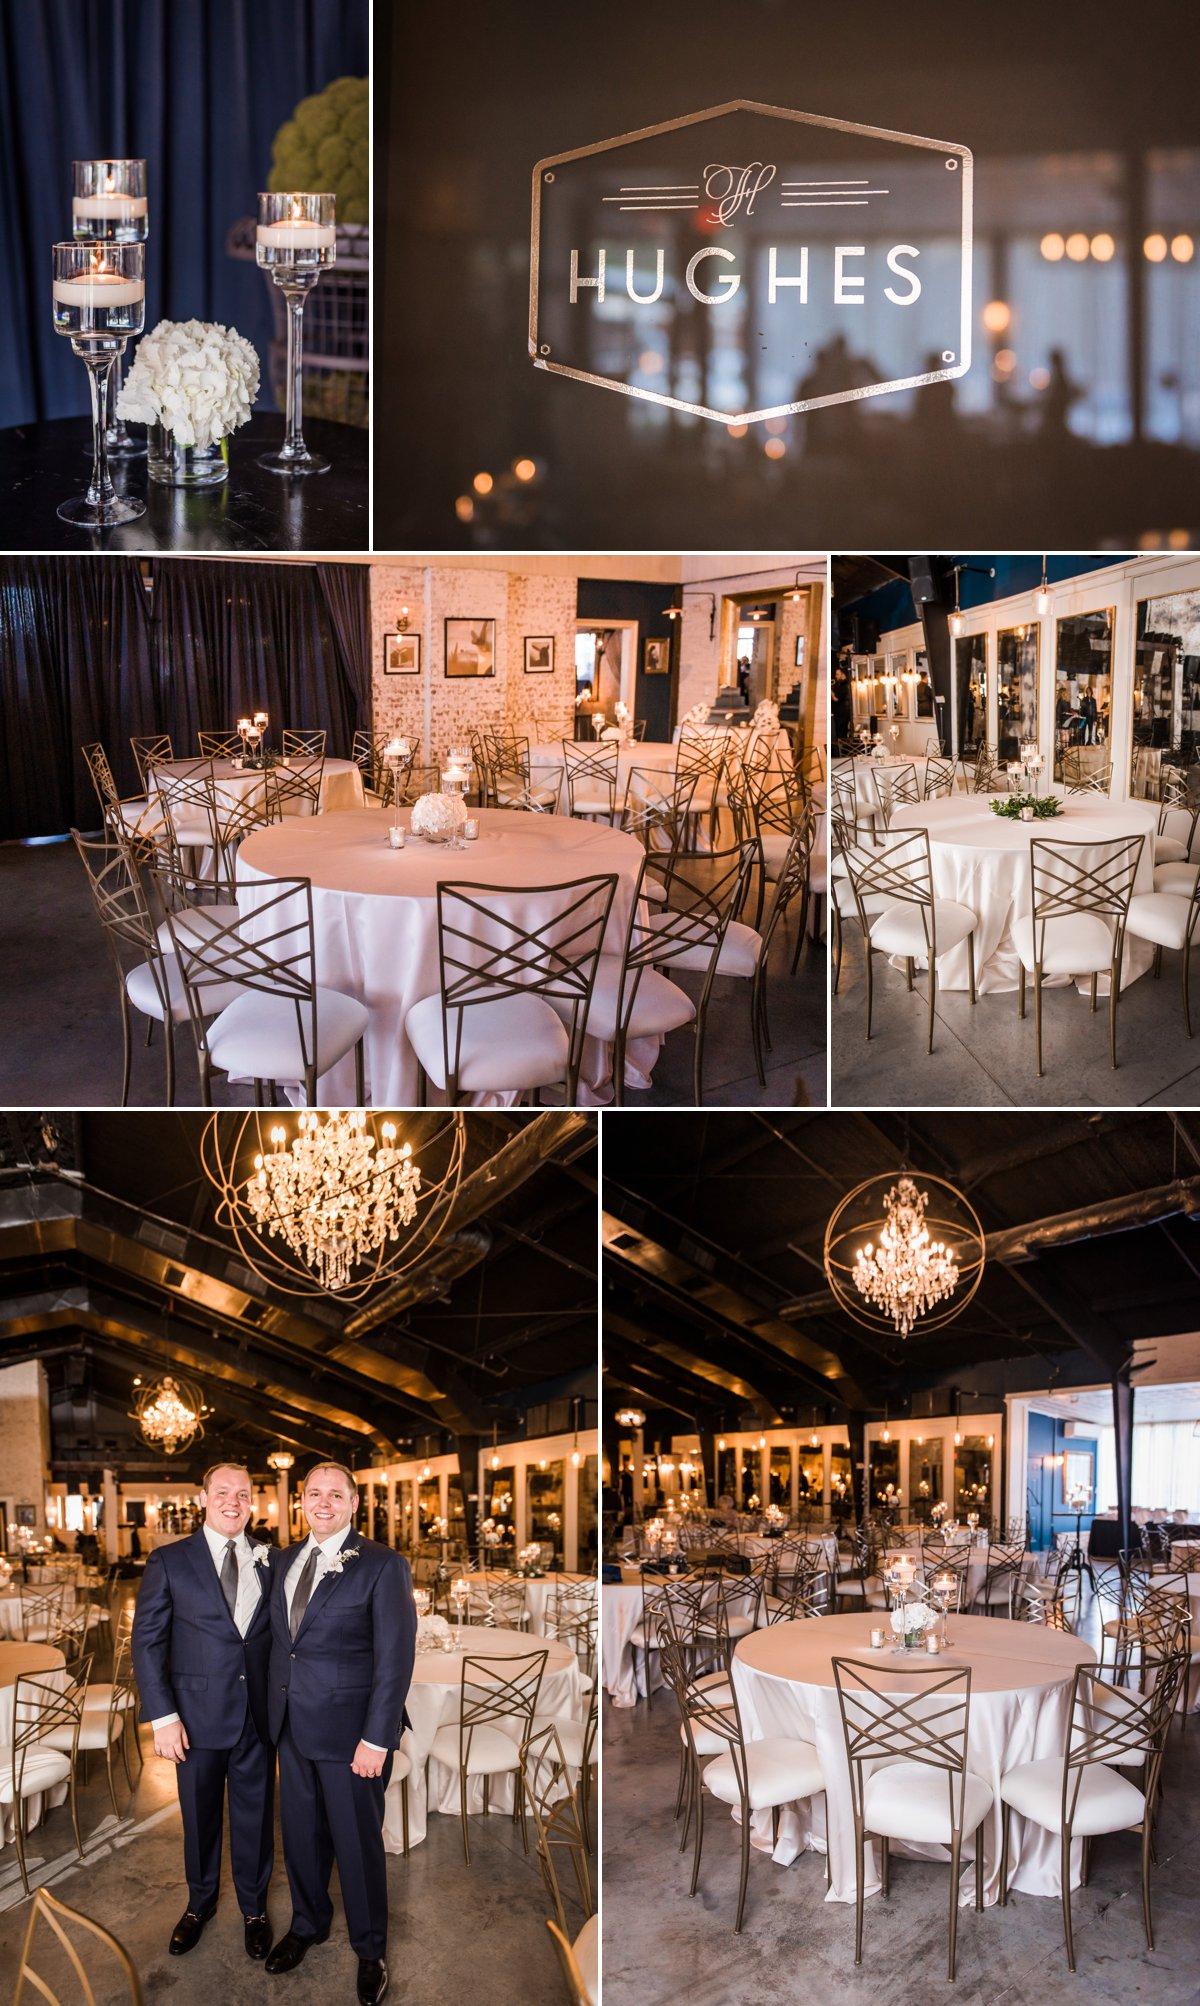 Hughes Manor Wedding Details and Decor